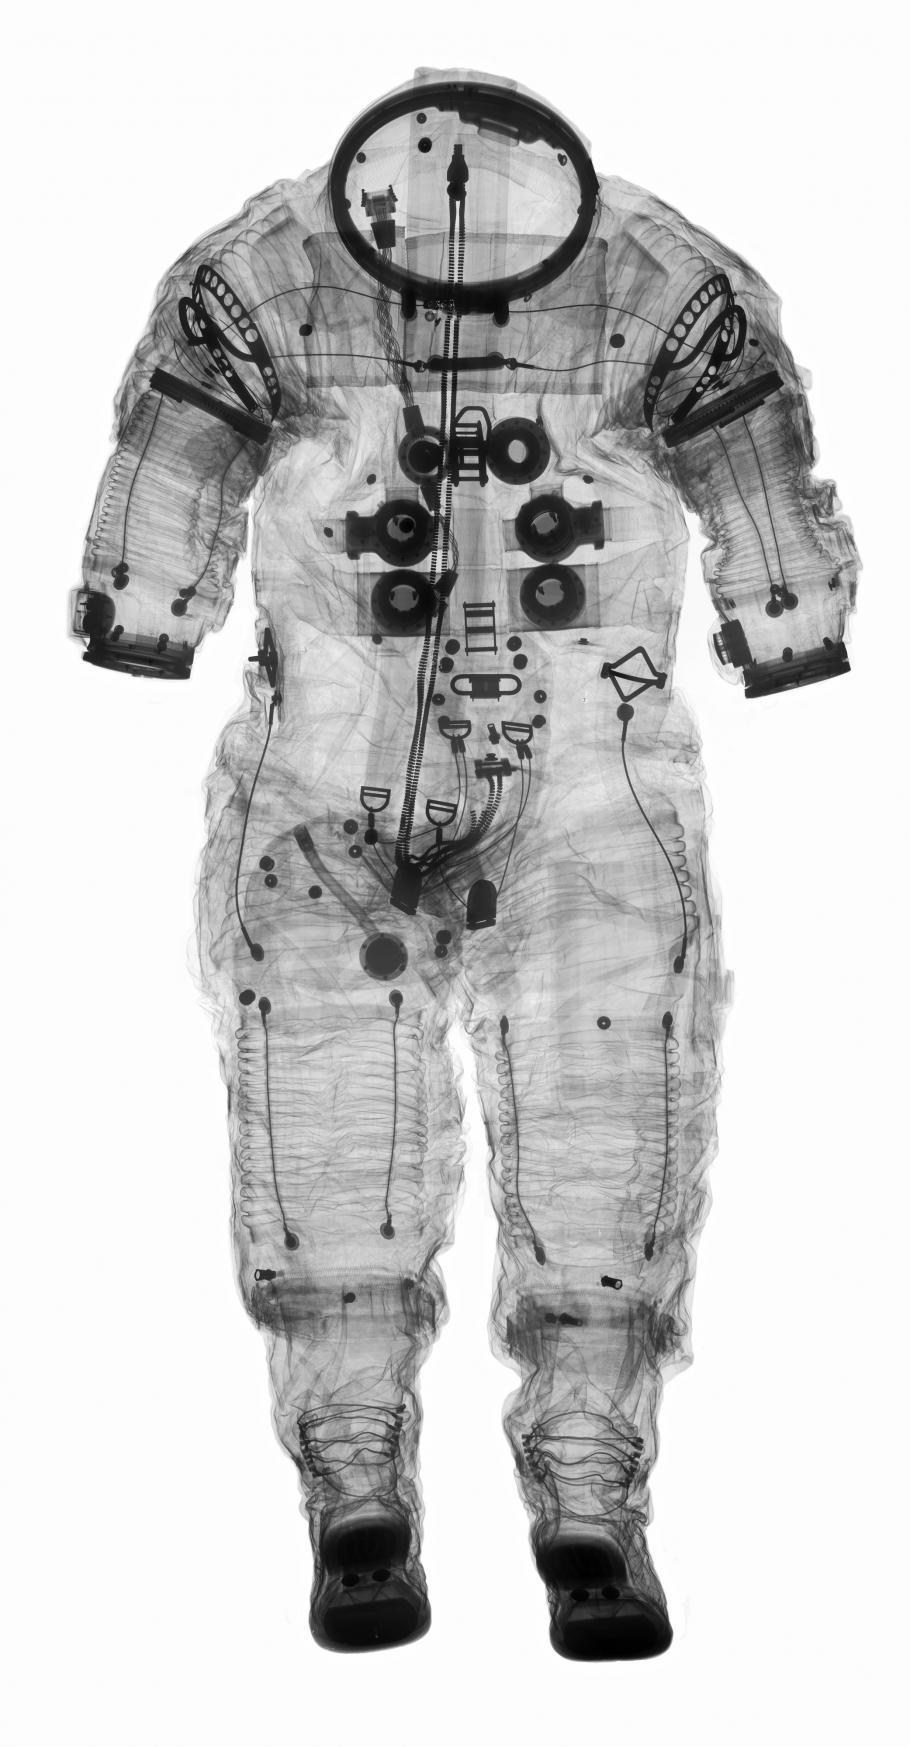 Alan Shepard's Apollo 14 Spacesuit